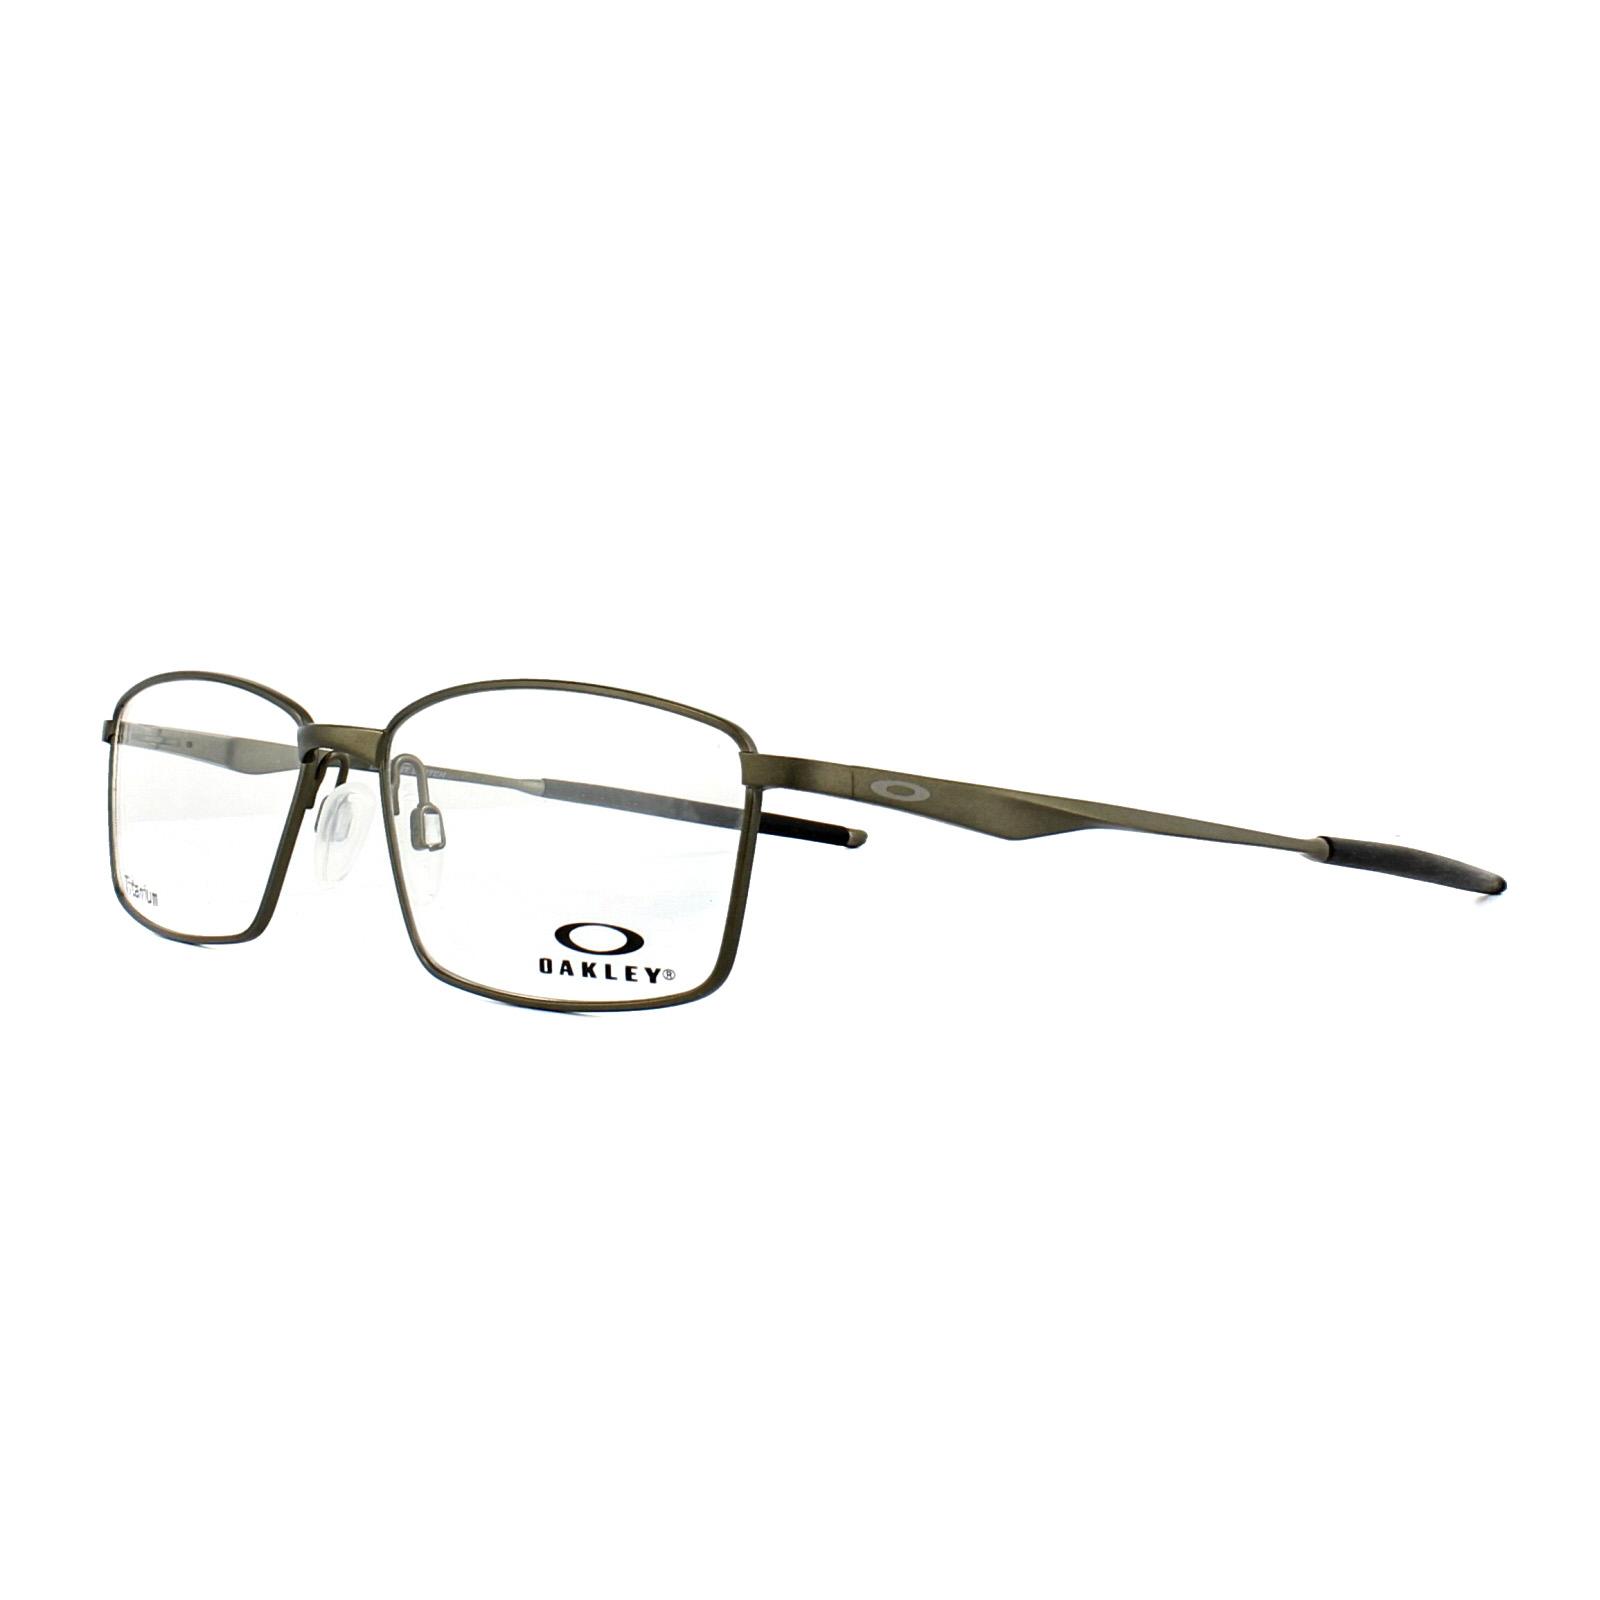 5182a0f770 Sentinel Oakley Glasses Frames Limit Switch OX5121-02 Pewter Black 55mm Mens